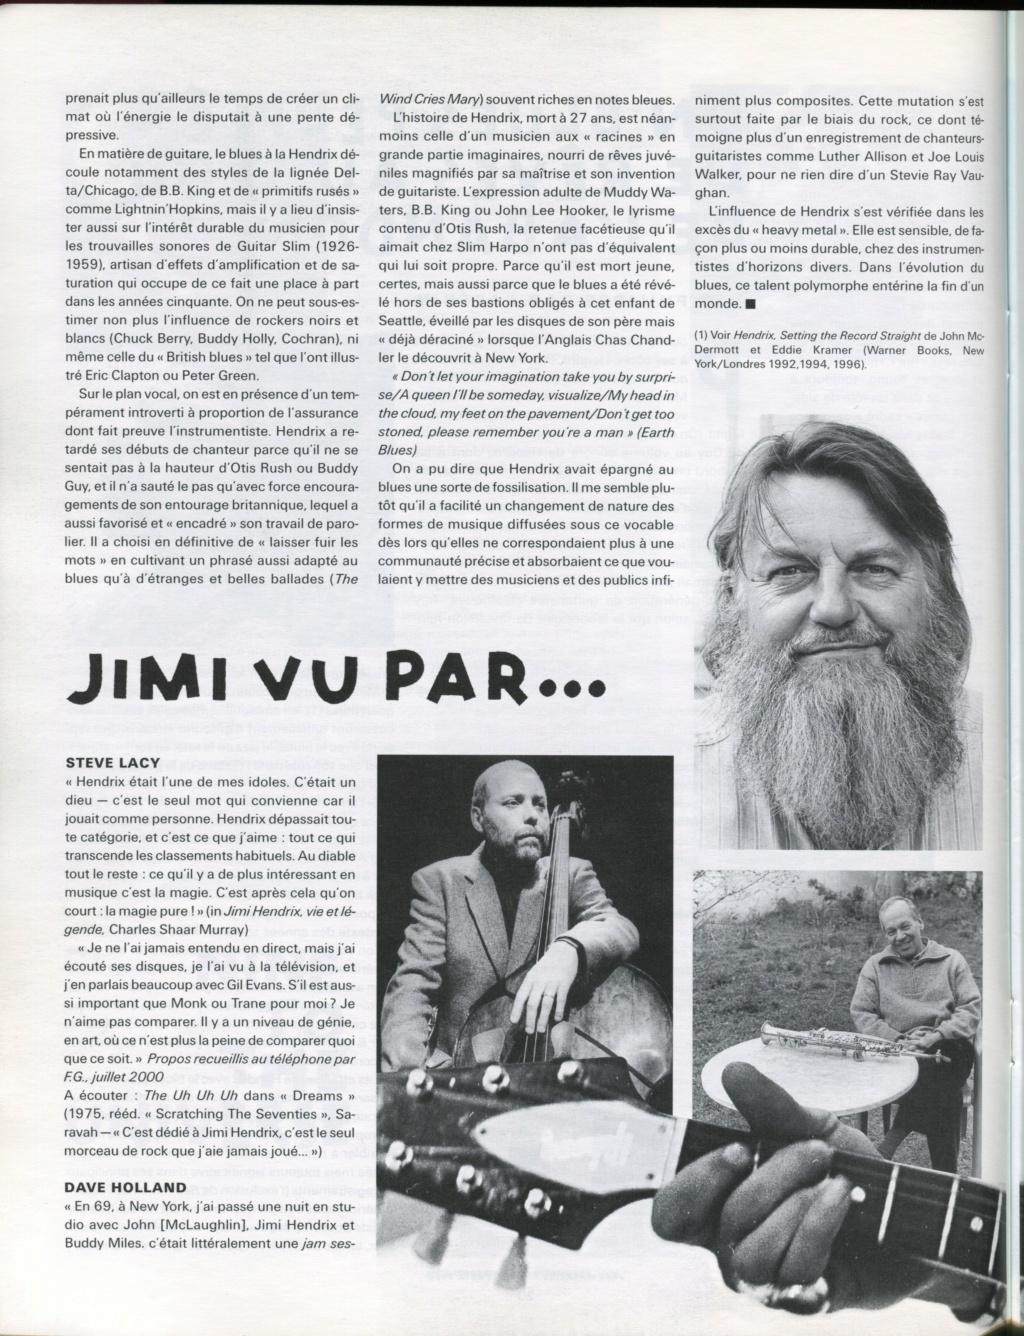 Magazines Français 1989 - 2014 - Page 2 1990_139